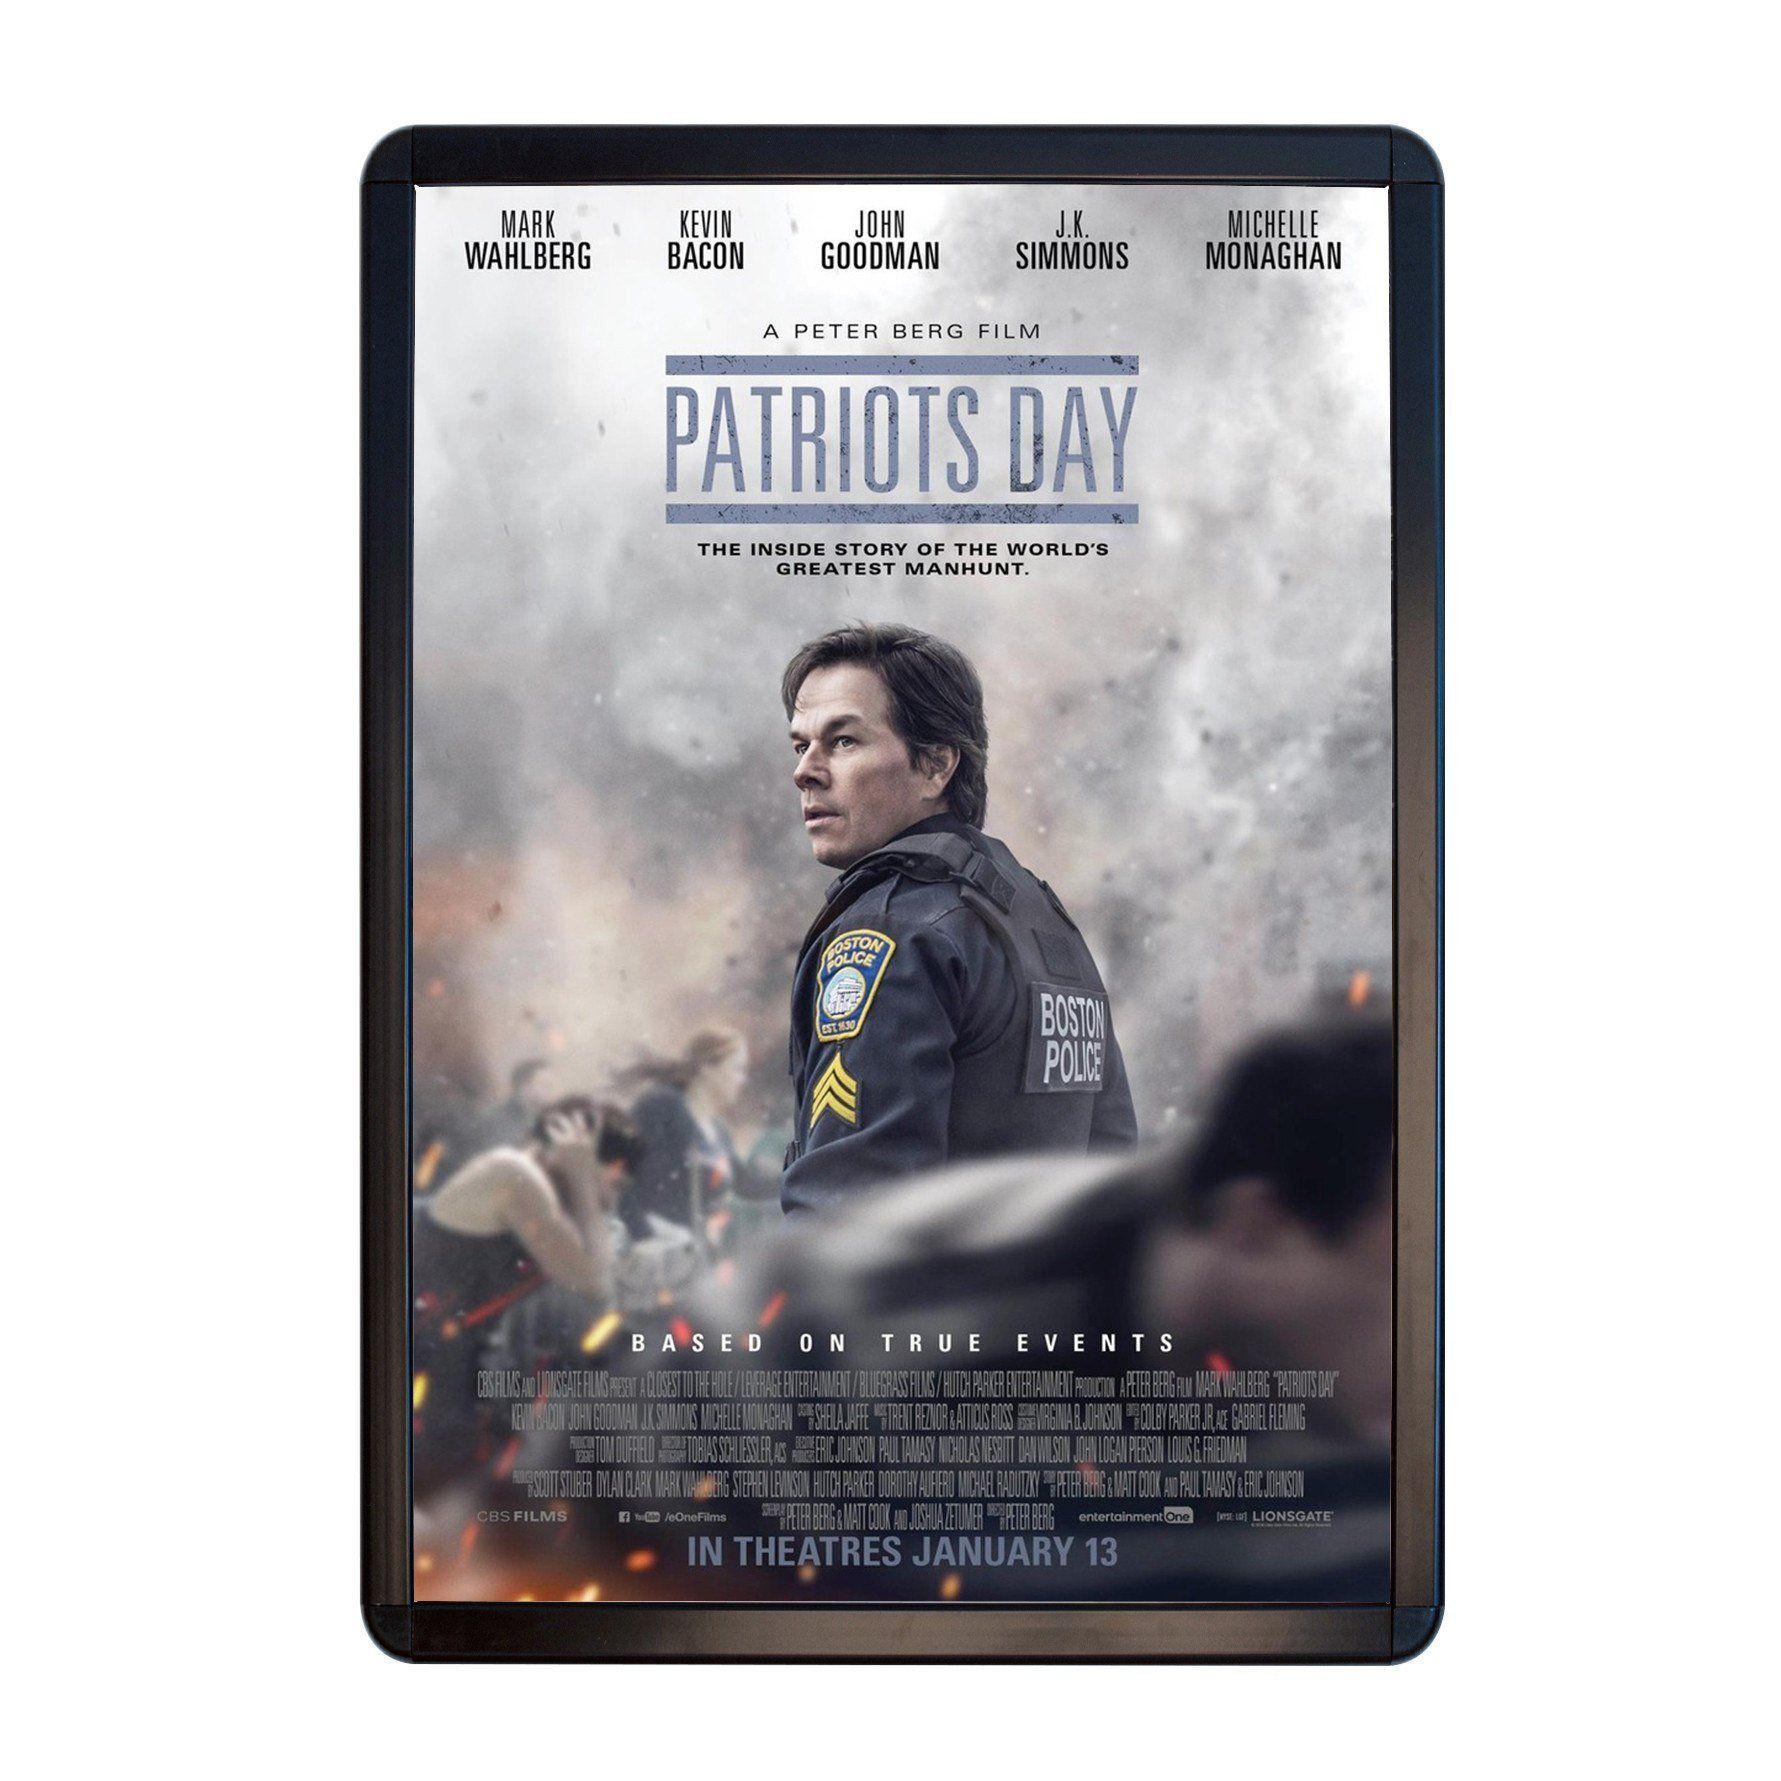 Black radial, round-corner movie poster frame poster size 27X40 ...